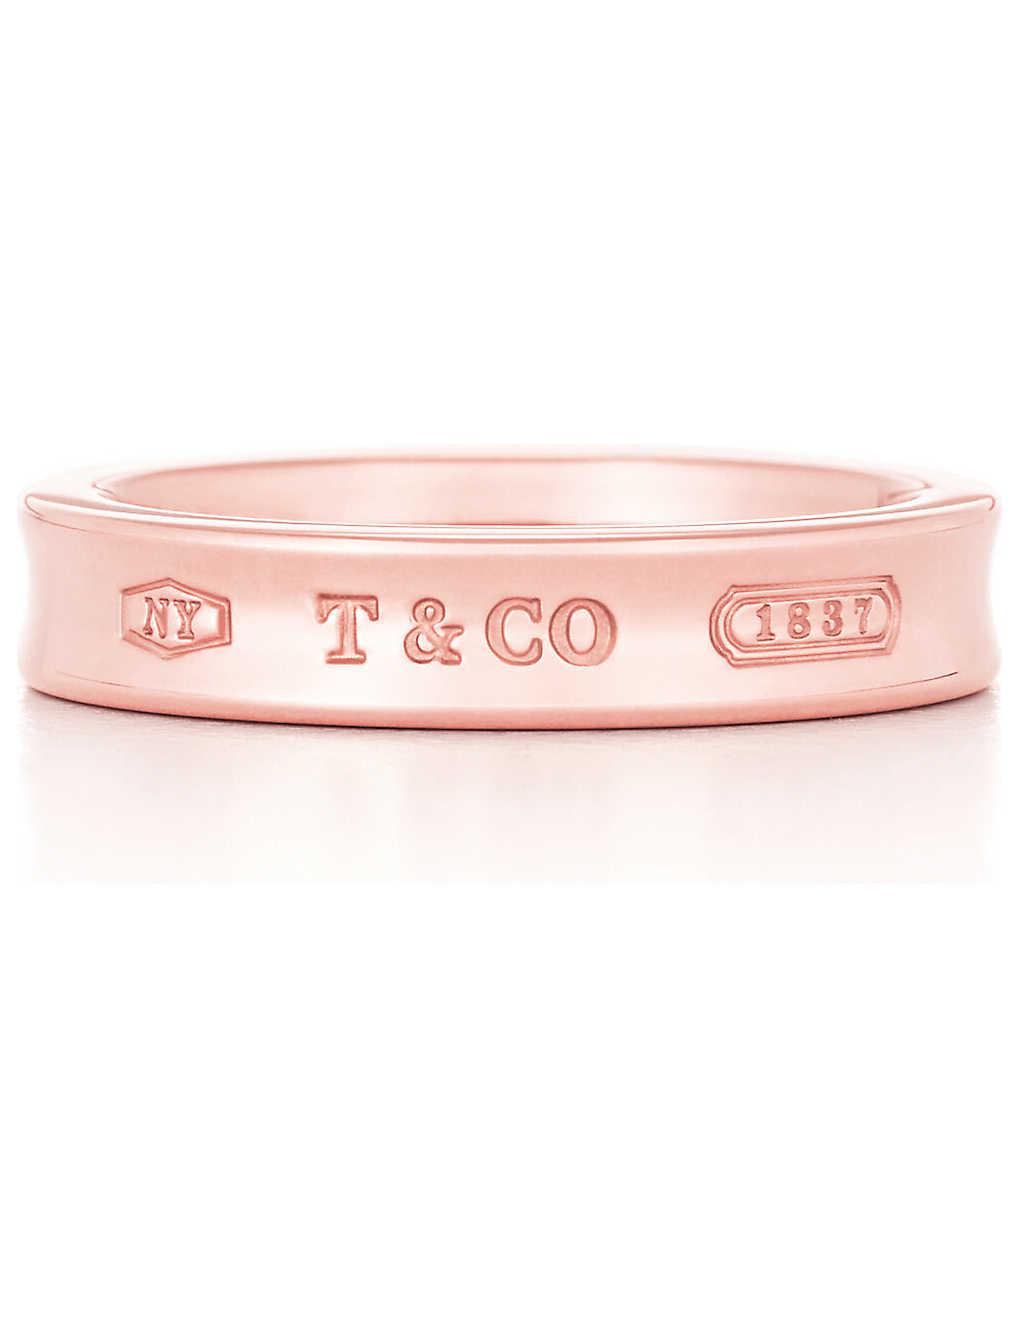 7a4917f1ad2 TIFFANY   CO - Tiffany 1837 narrow ring in RUBEDO metal